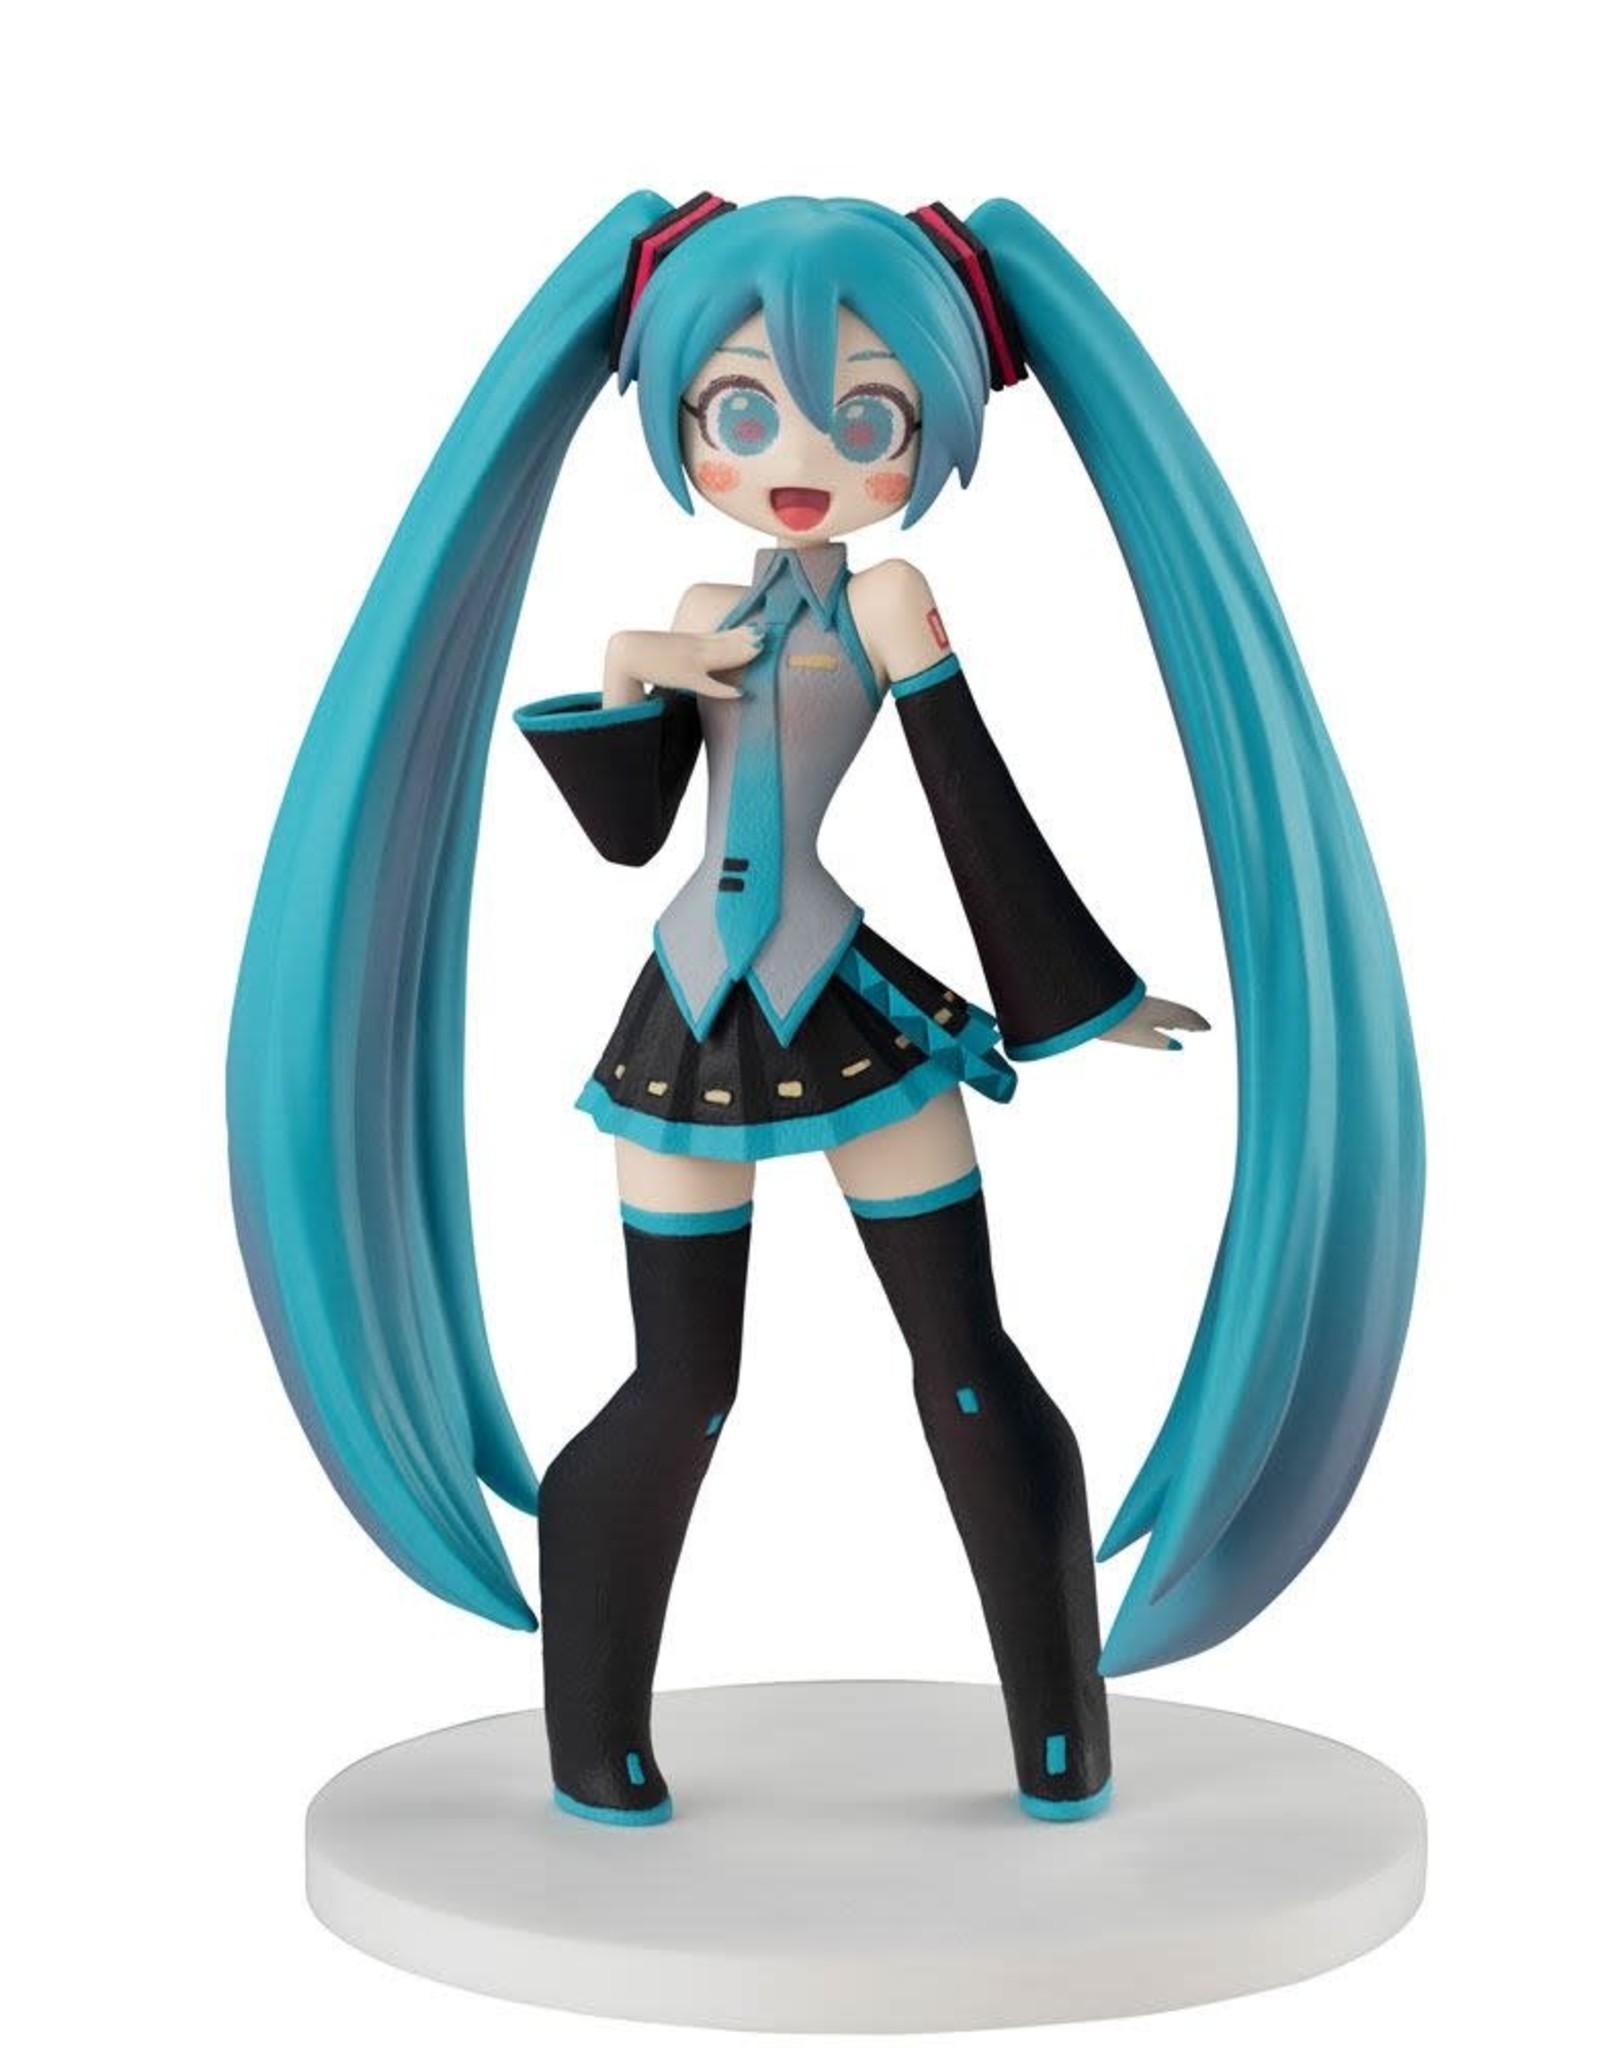 Hatsune Miku - Tokyo CartoonY Vocaloid PVC Statue - 16 cm